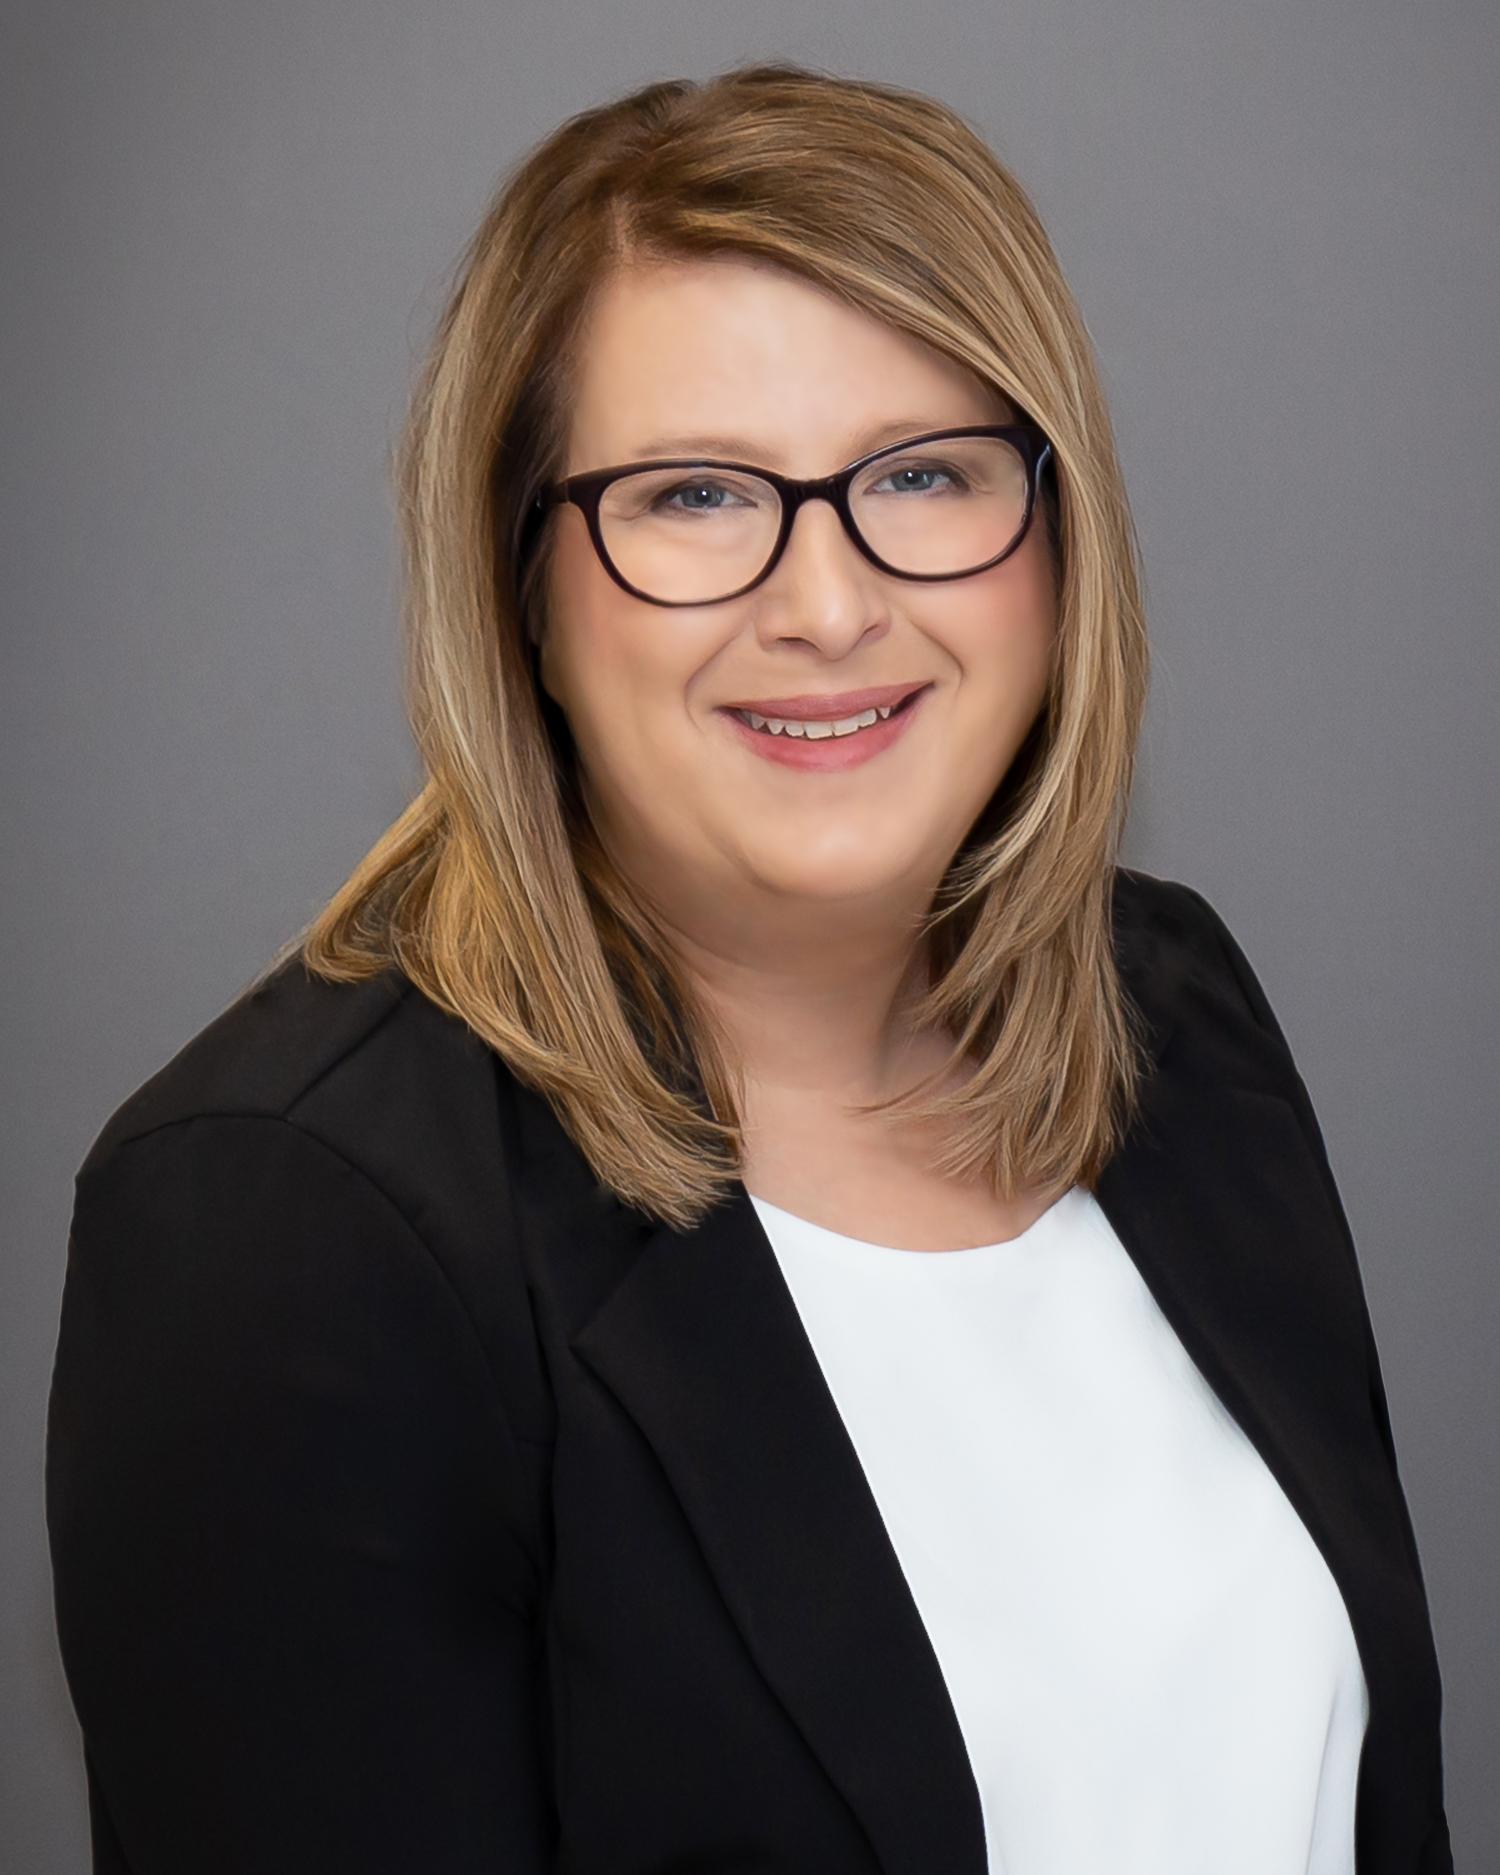 Melissa Jordan, Family lNurse Practitioner